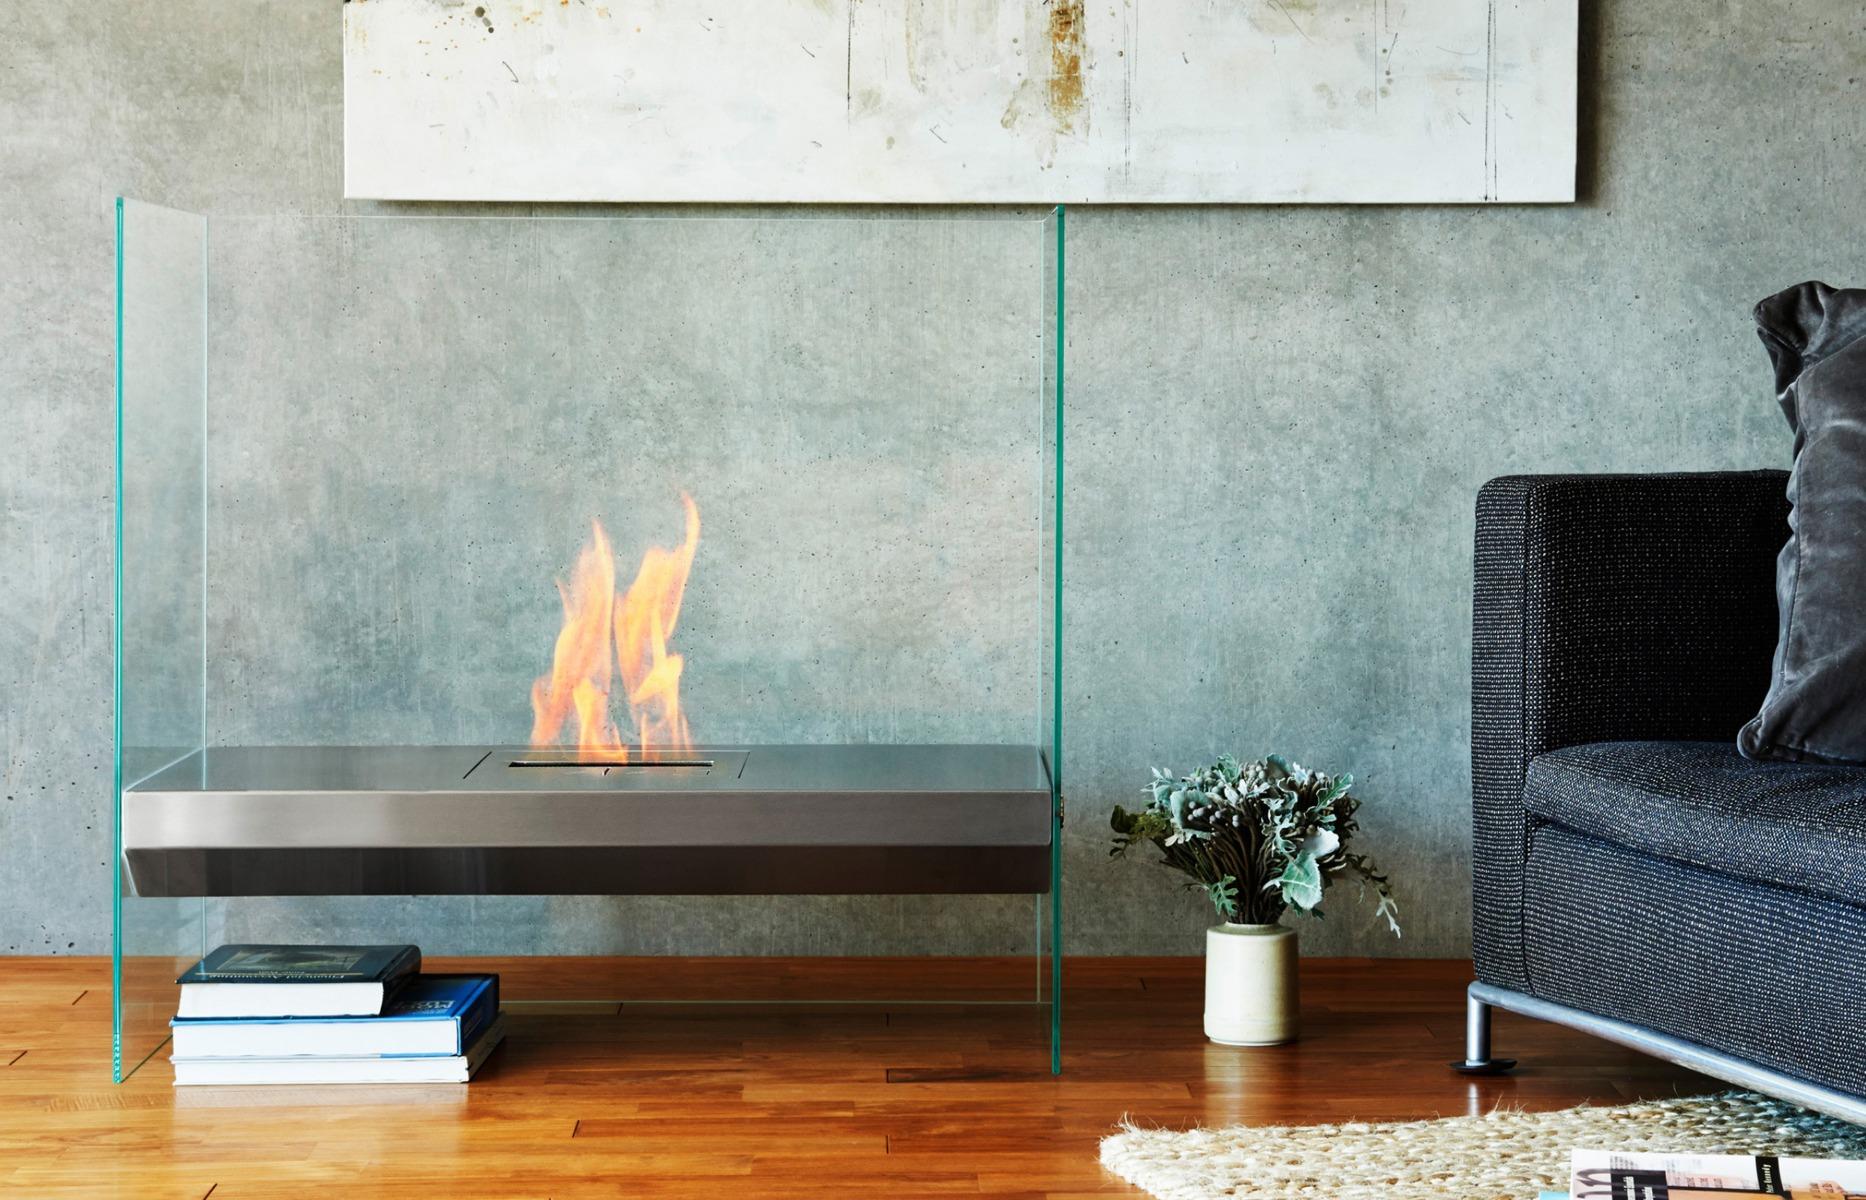 EcoSmart Fire Igloo BK5 Burner Designer Fireplace